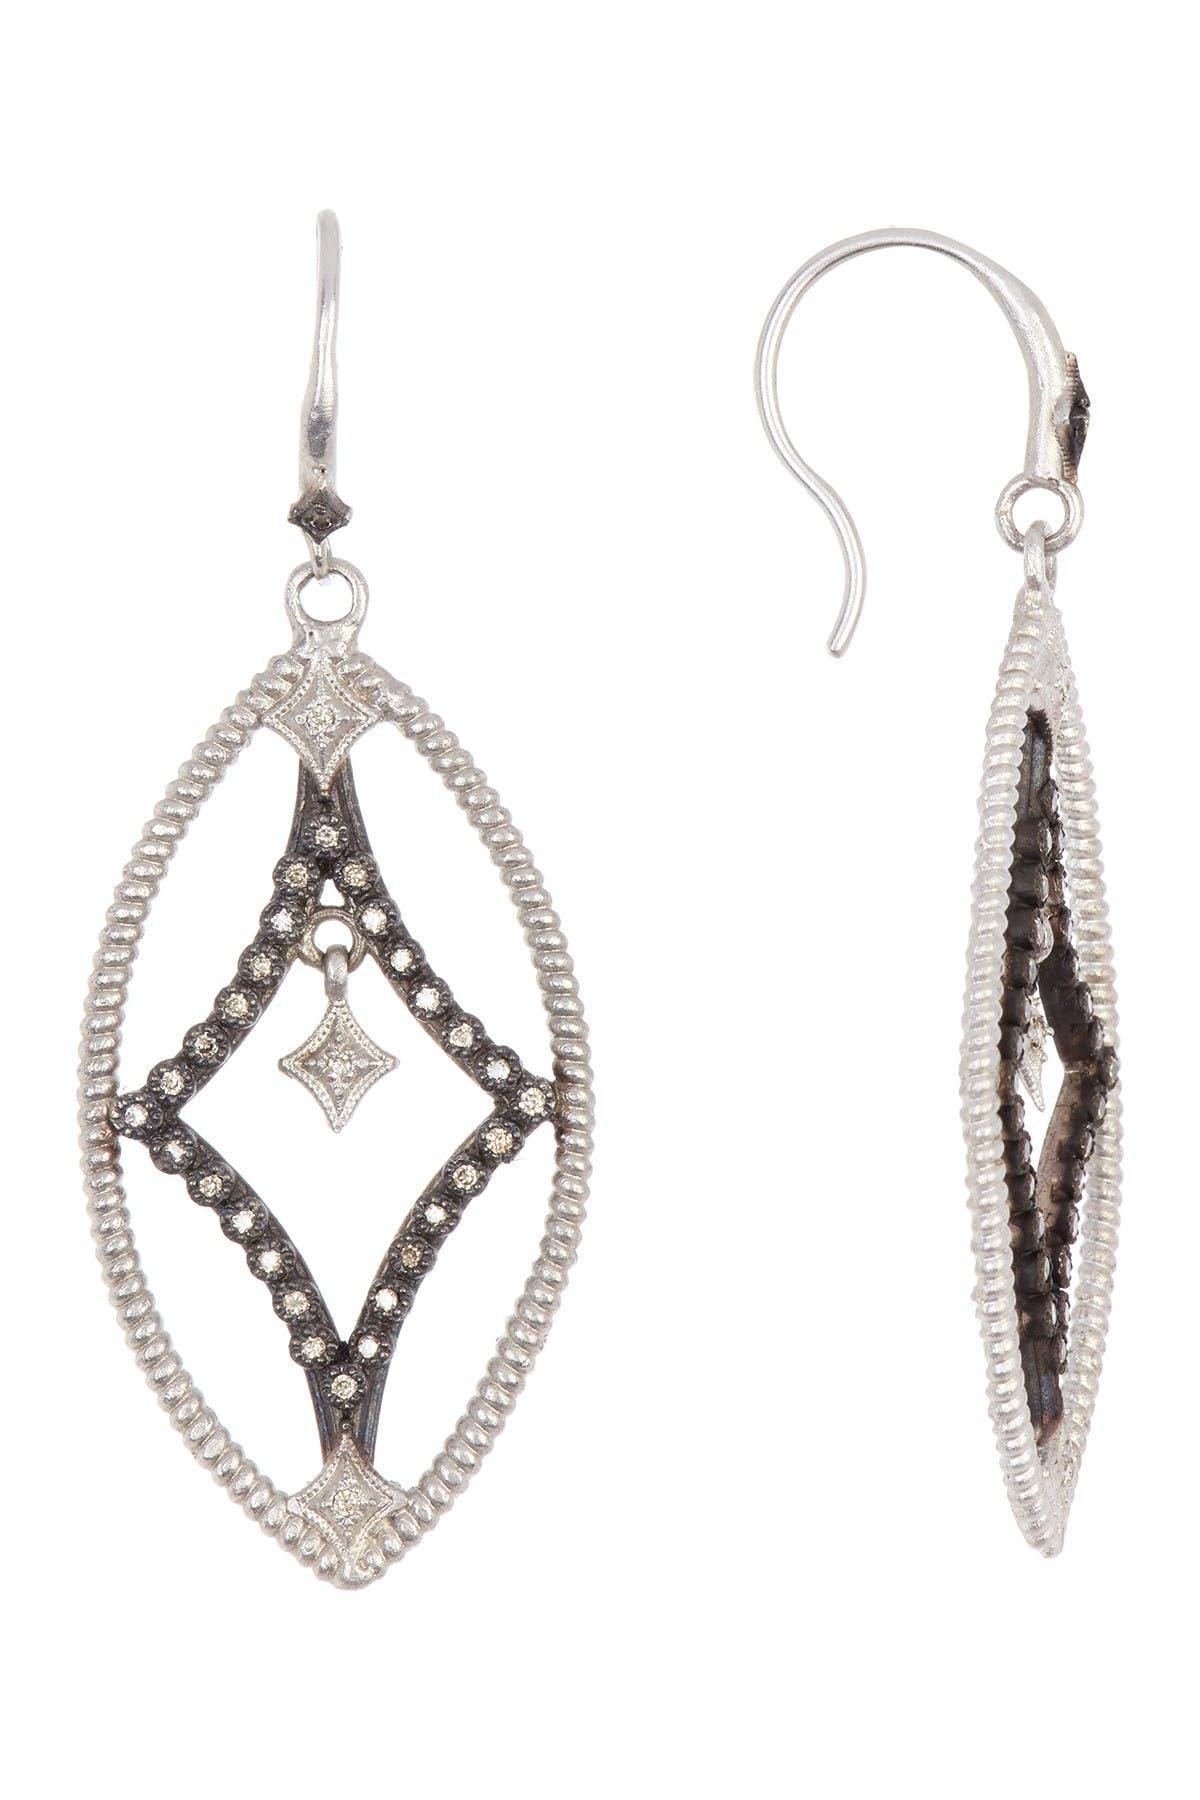 Image of ARMENTA New World Drop Earrings